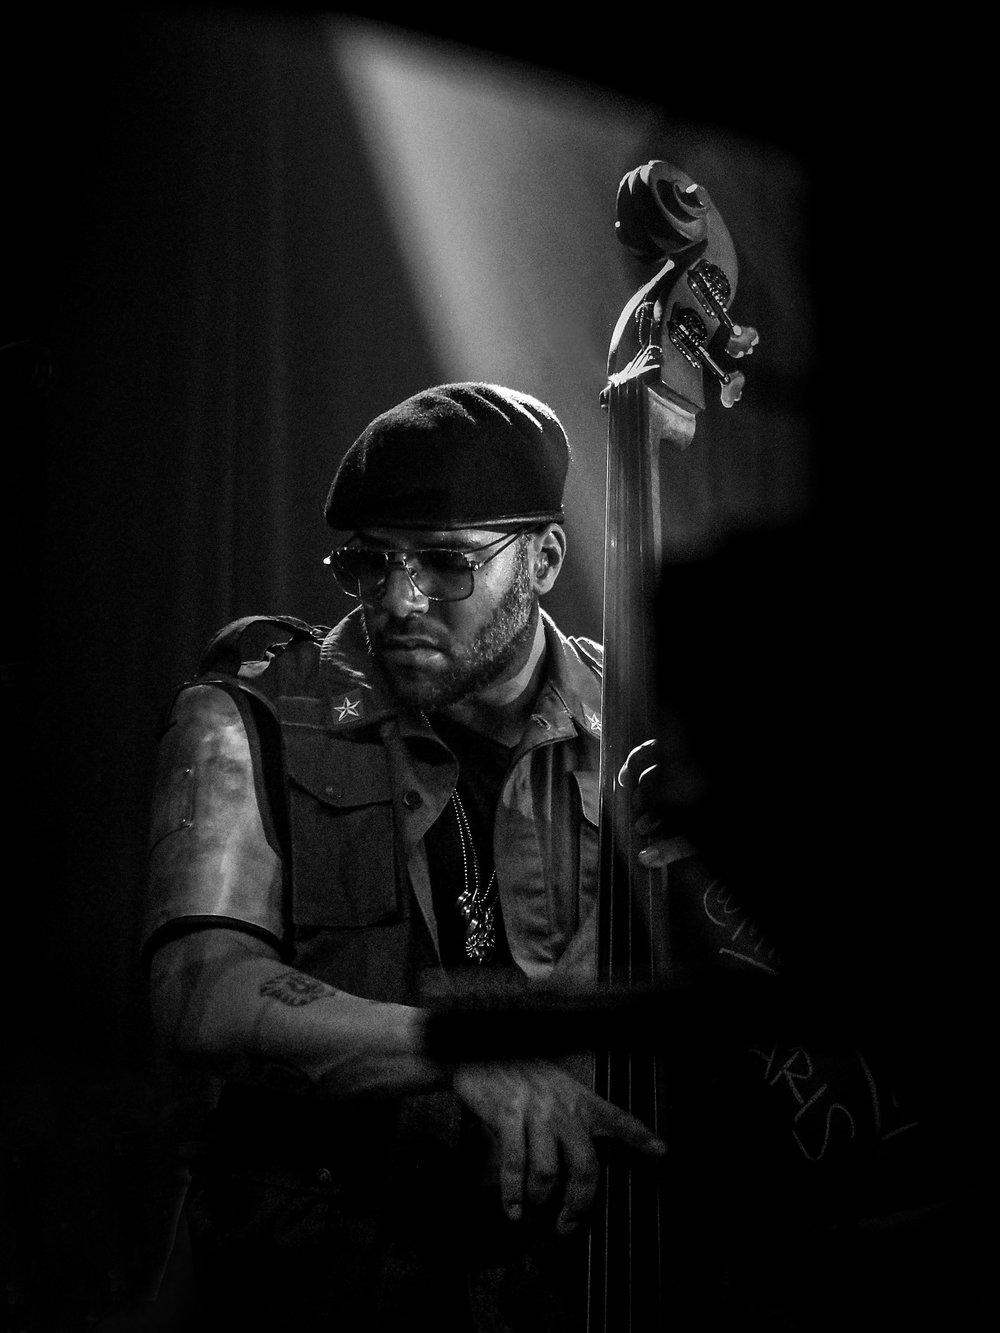 P1011133_Miles Mosley 2 - Kamasi Washington show - by Elina Tran.jpg